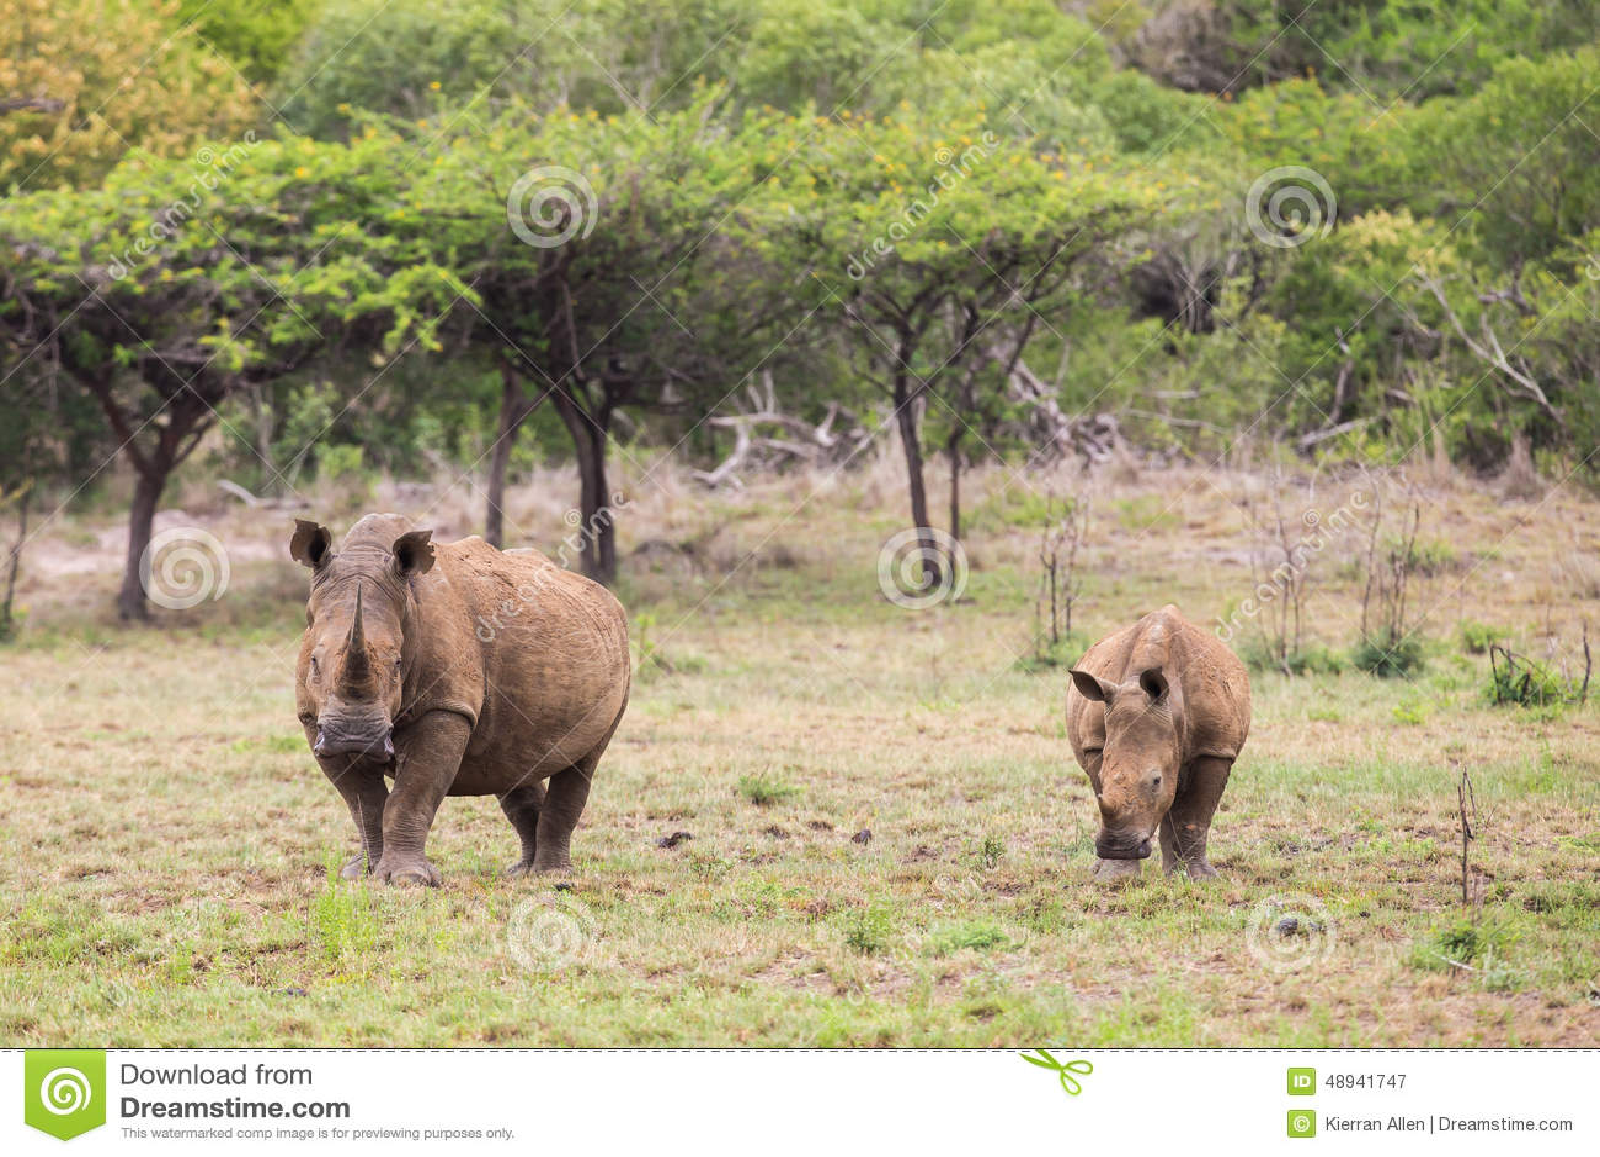 White Rhino and Calf South Africa